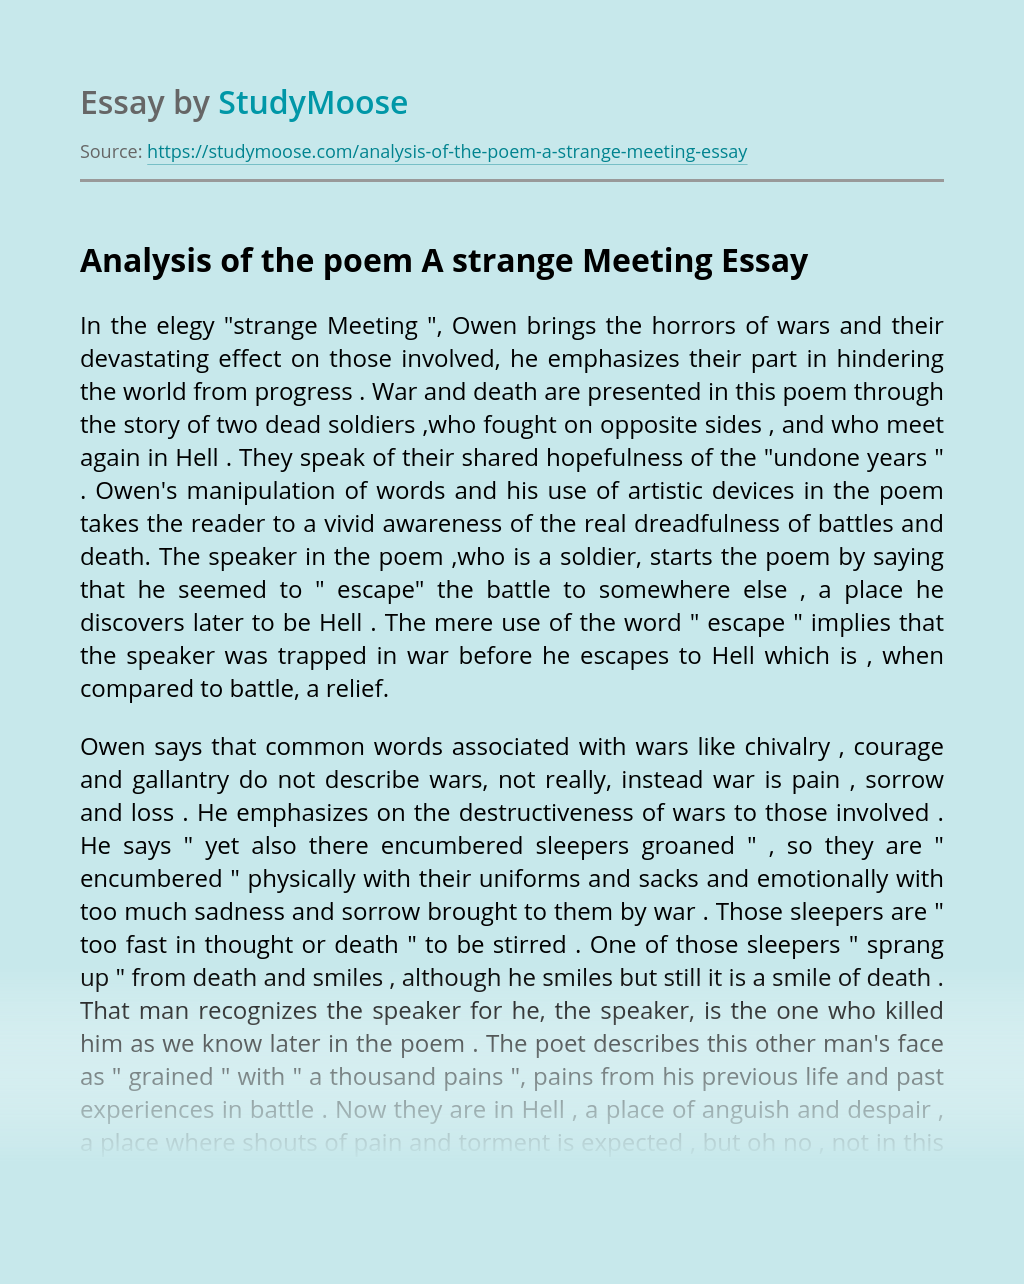 Analysis of the poem A strange Meeting